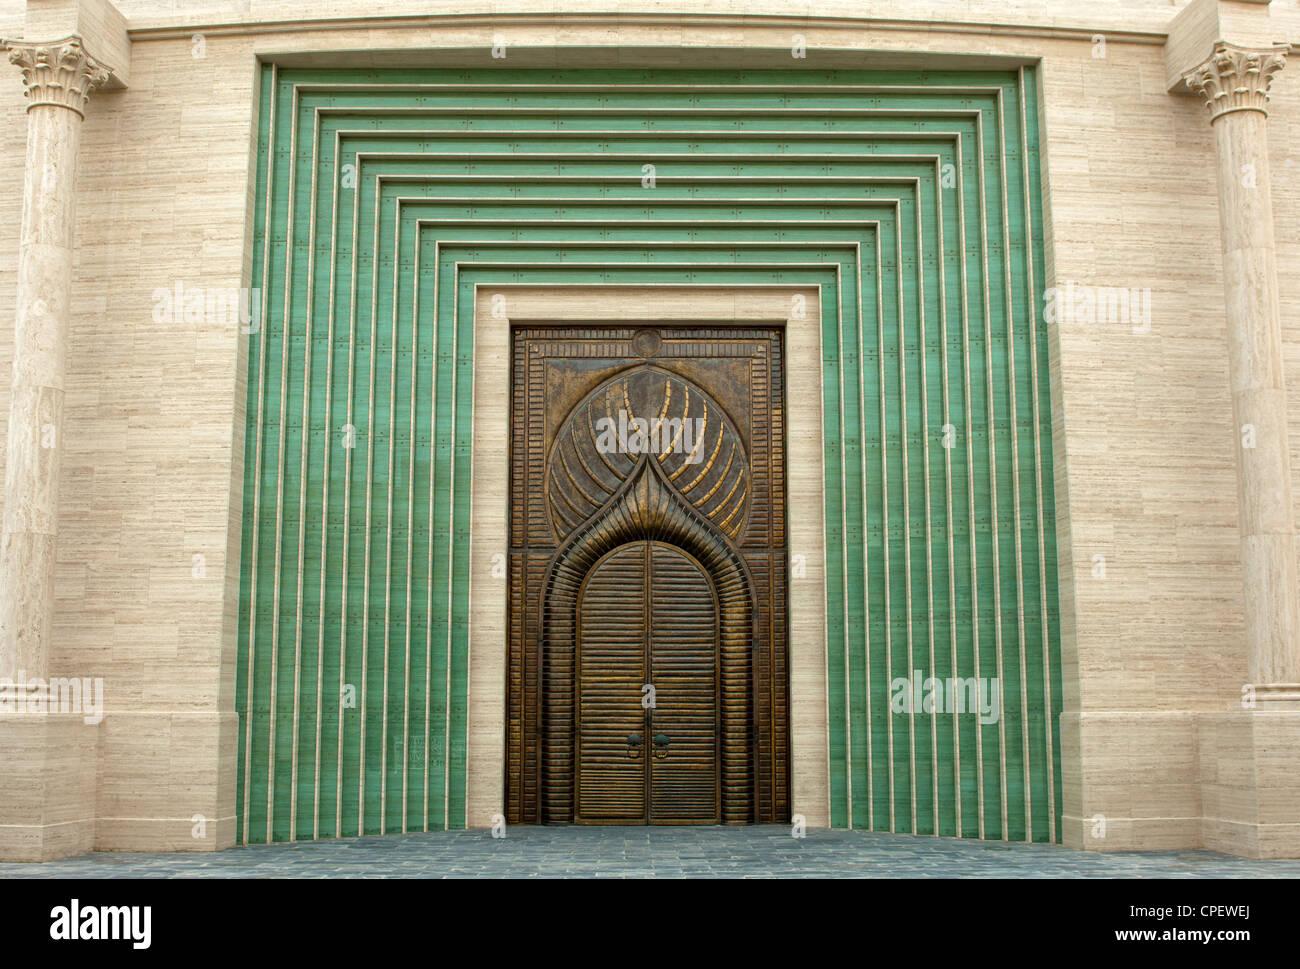 Ornate copper door of the portal of the amphitheatre at the Katara Cultural Village, Doha, Qatar - Stock Image